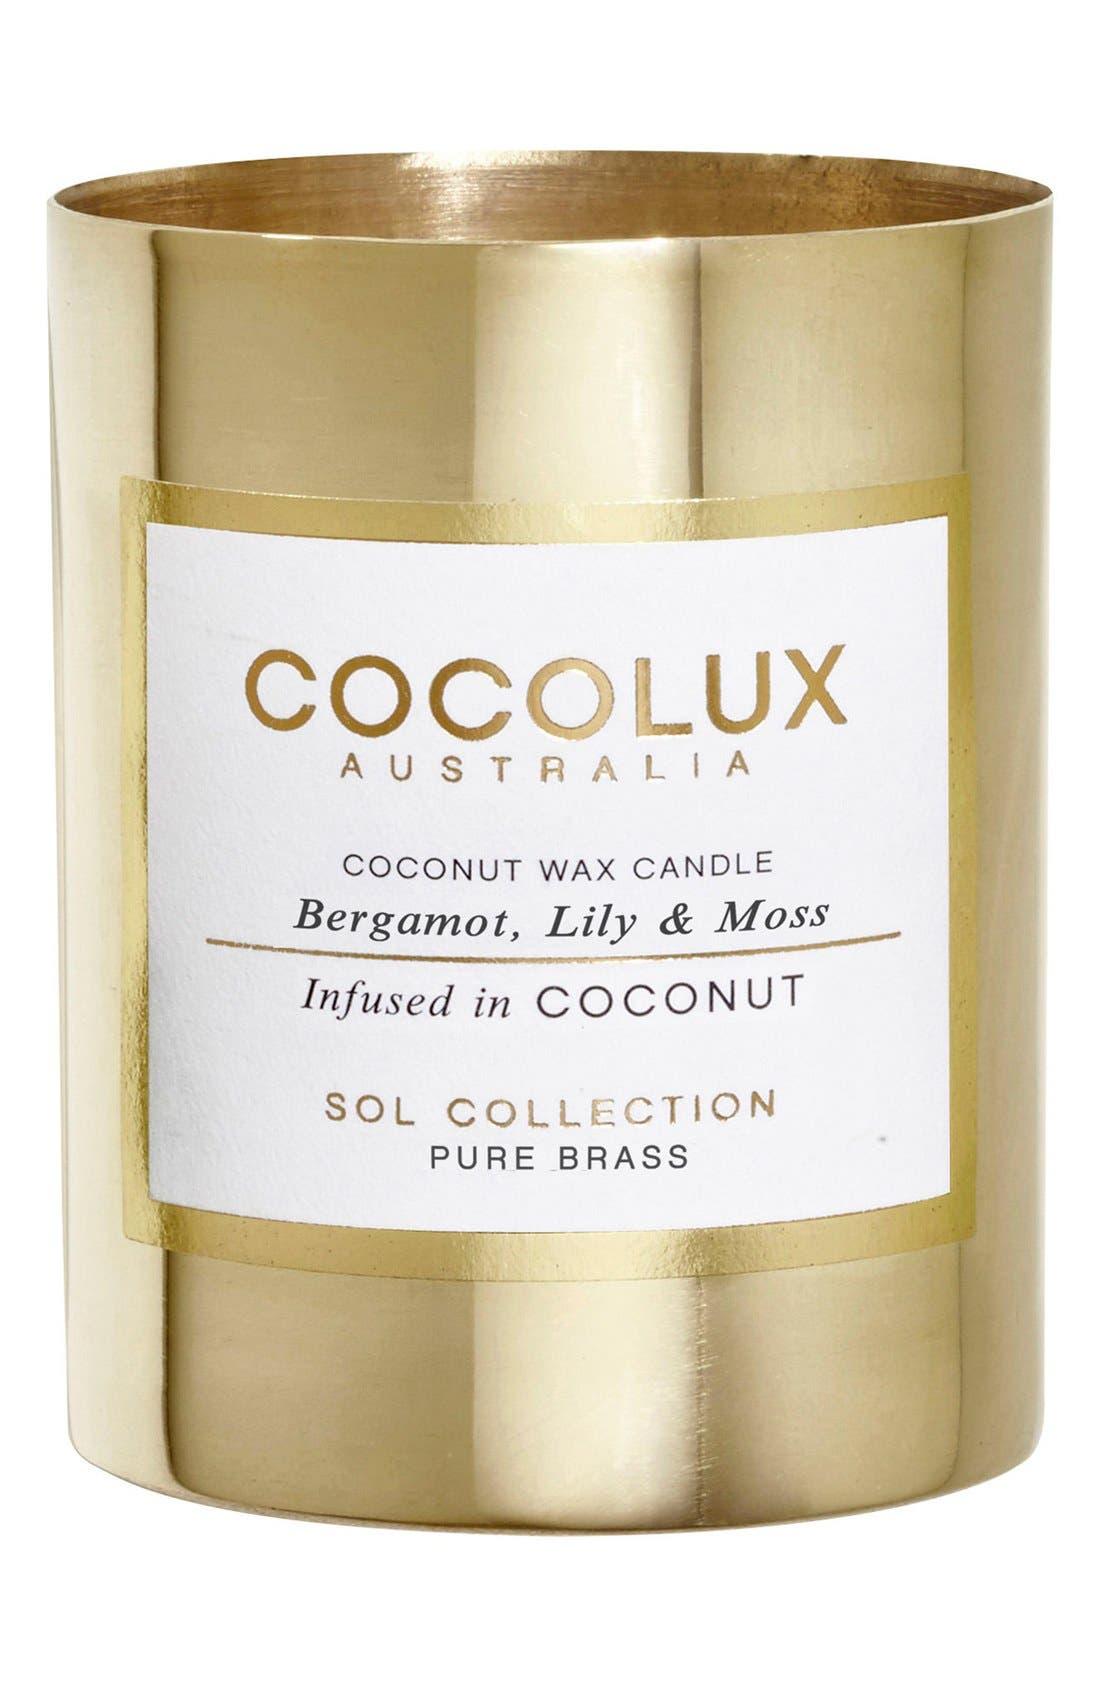 COCOLUX AUSTRALIA Bergamot, Lily & Moss Small Brass